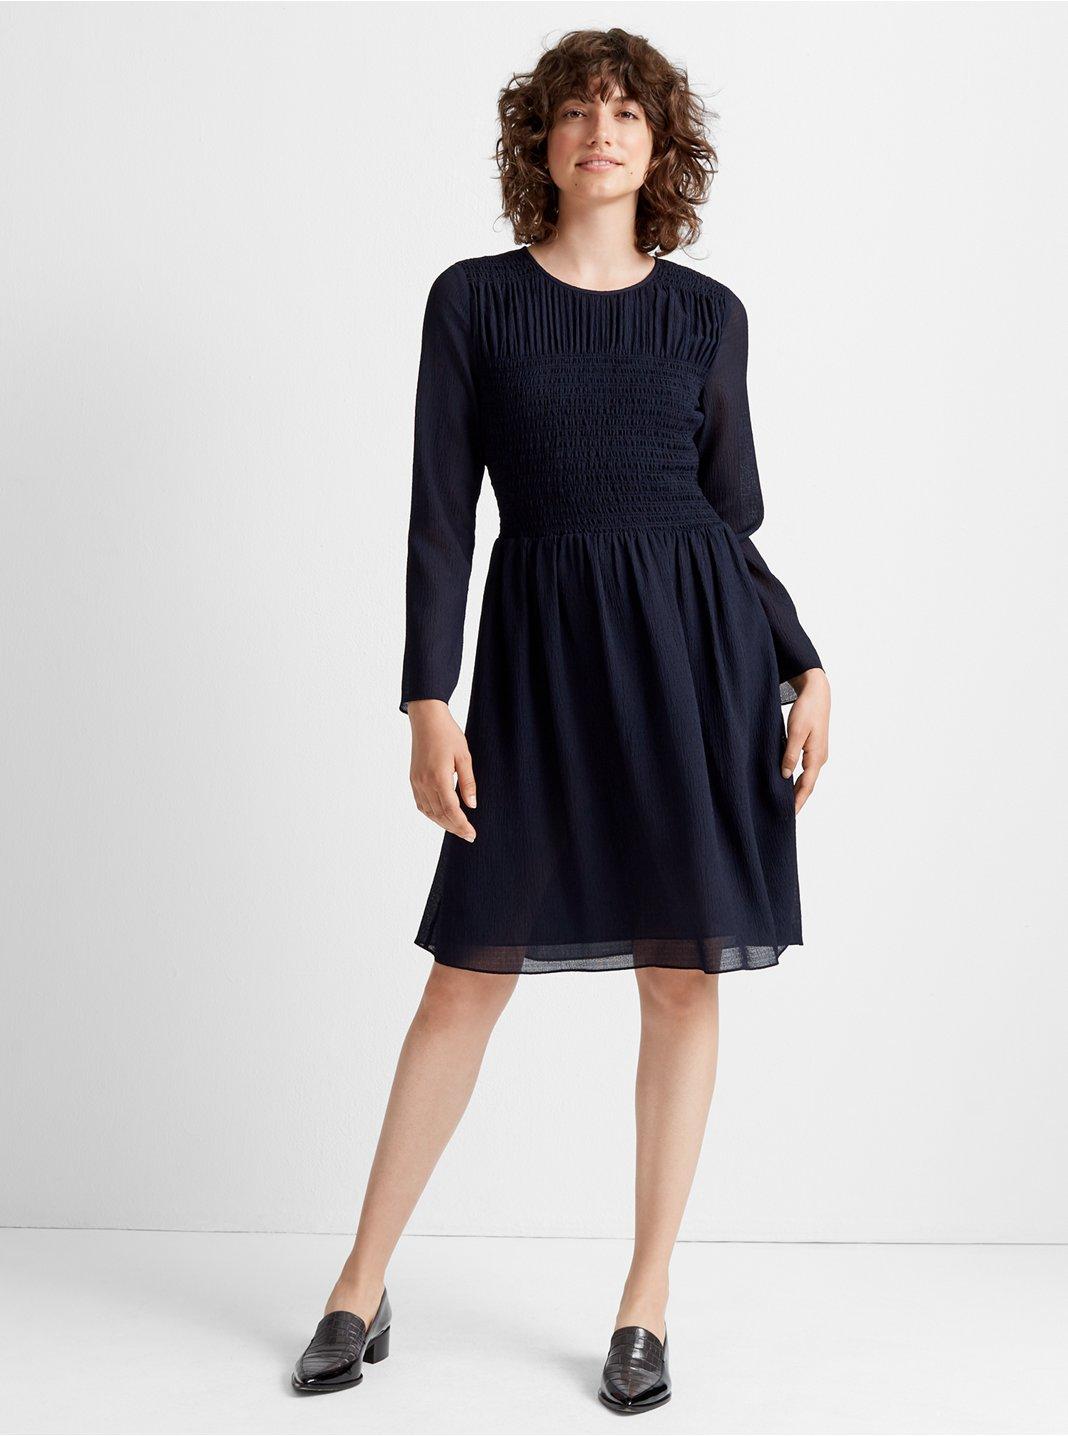 b92d65967 Women's Dresses | Club Monaco